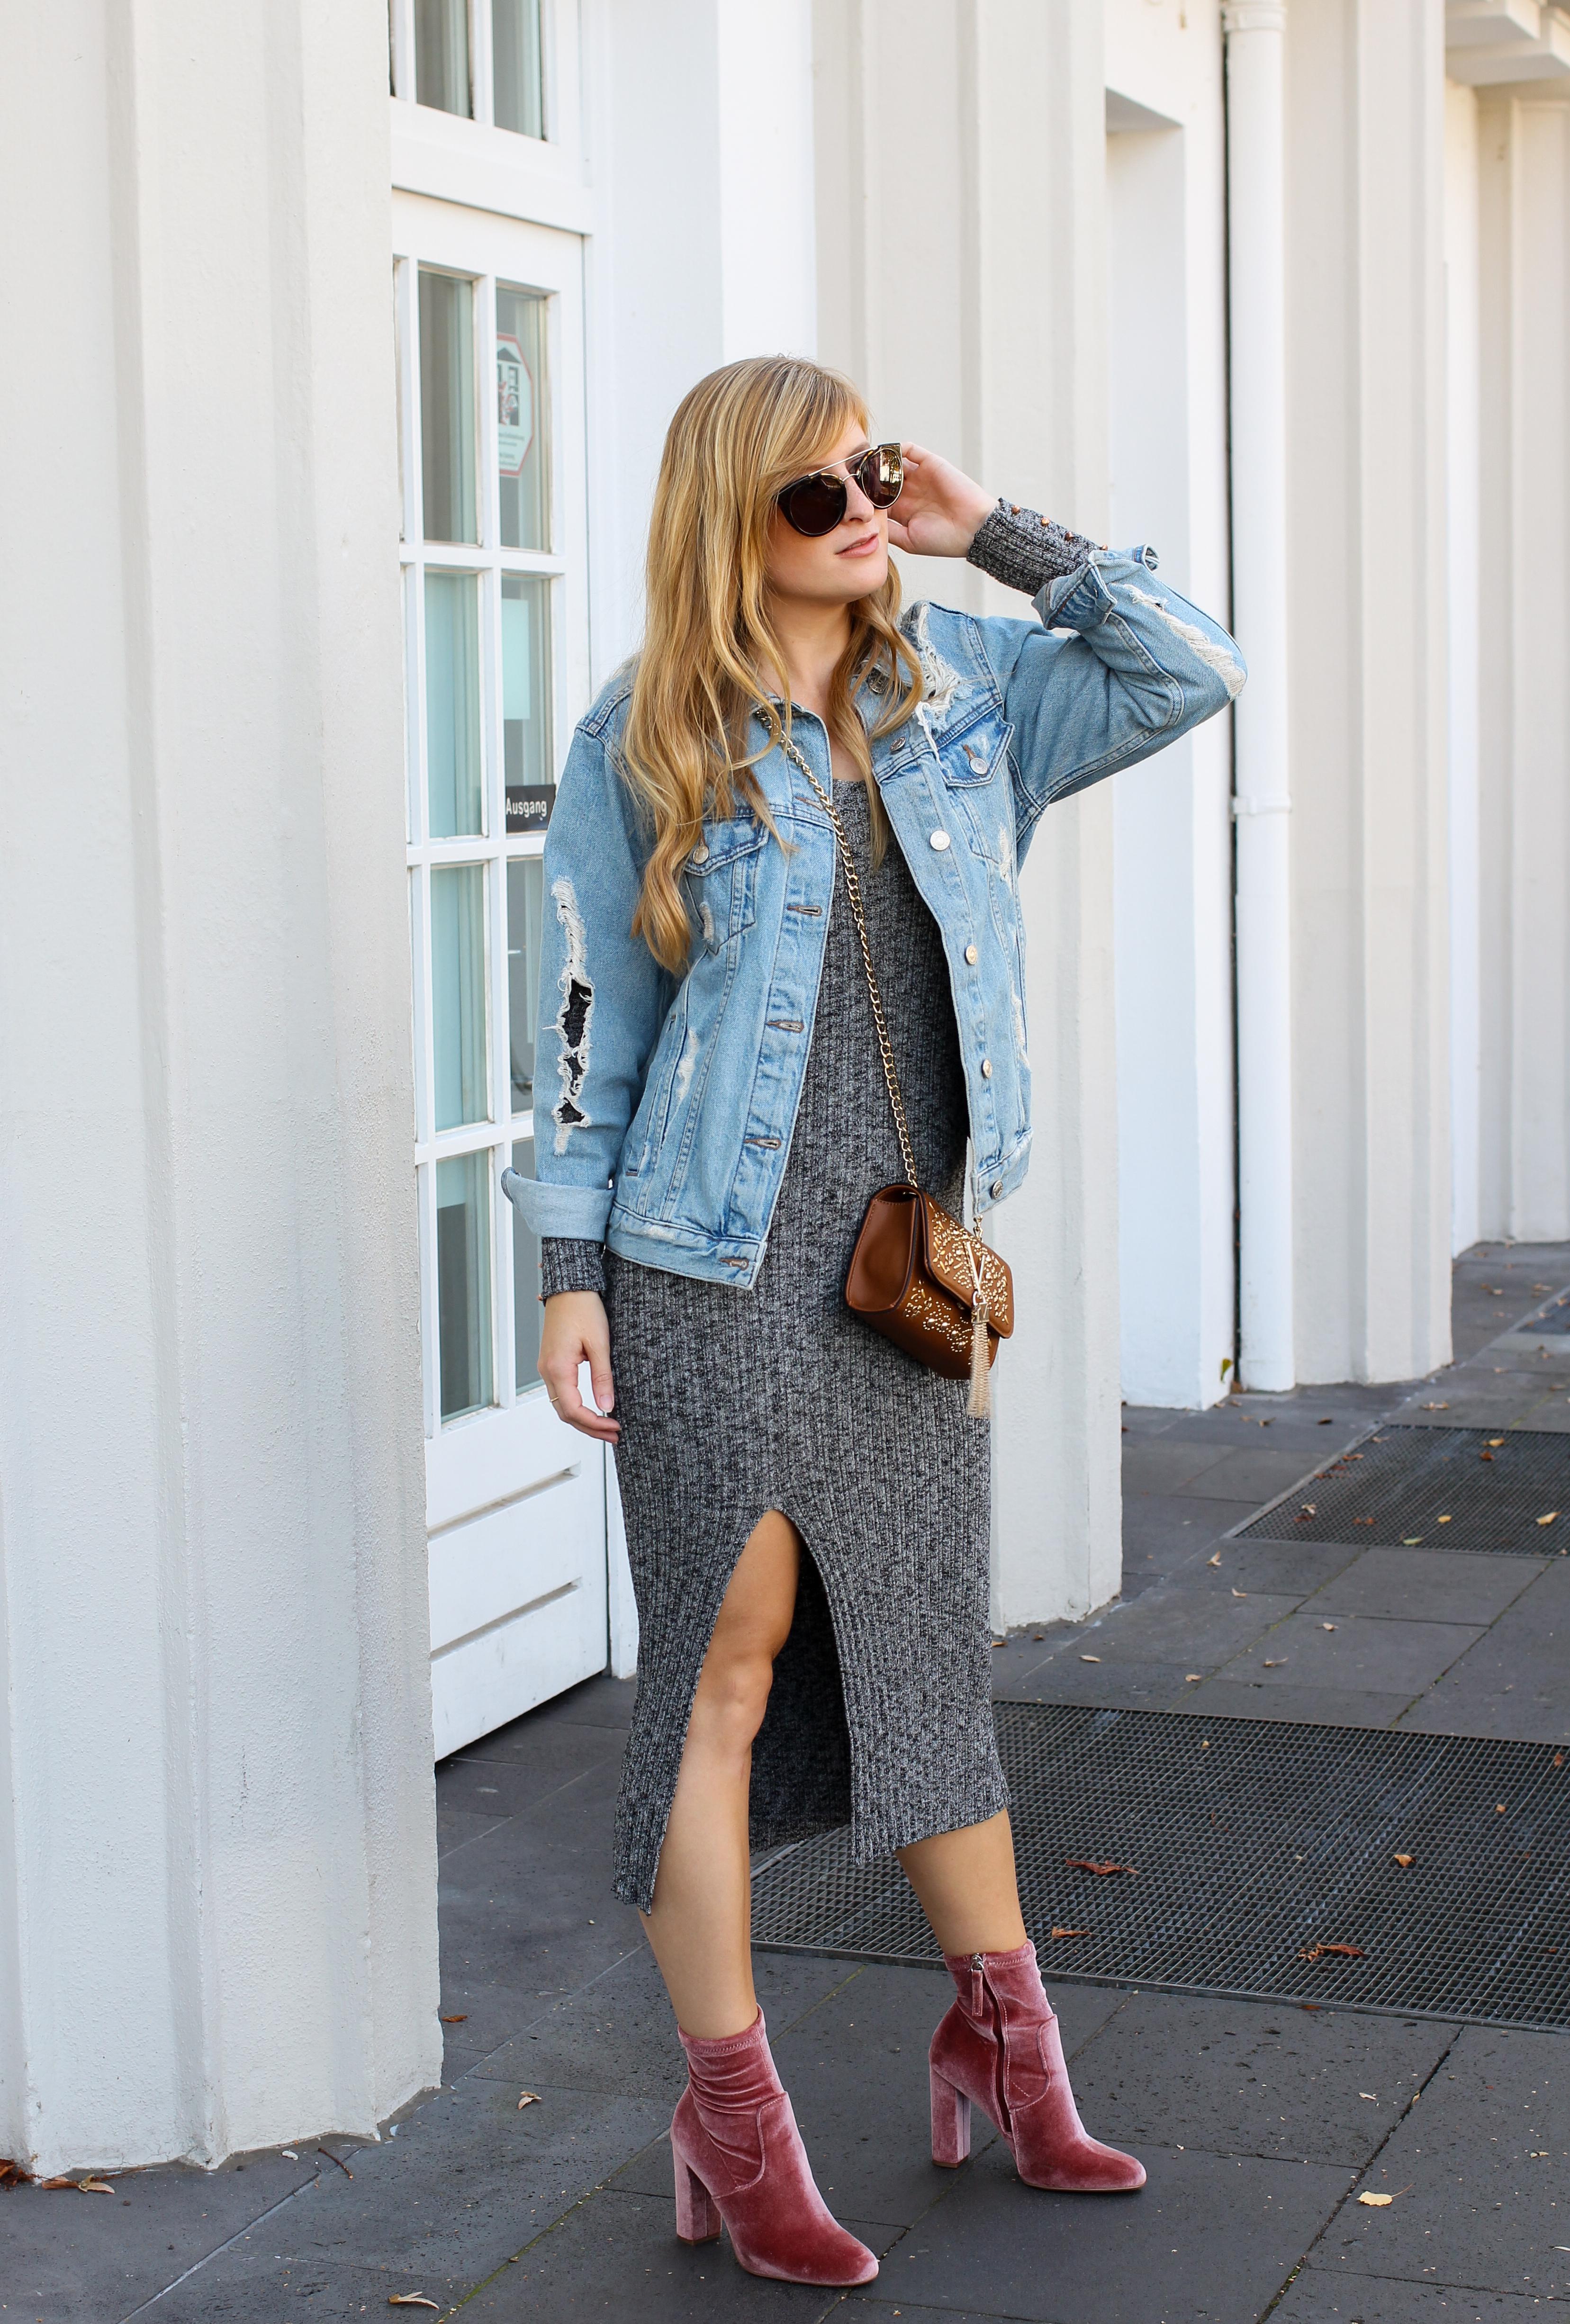 Herbstfavorit Wollkleid grau kombinieren Outfit rosa samt Heels Stiefeletten Jeansjacke Valentino Handbags Fashion Blog Bonn Herbstoutfit 1